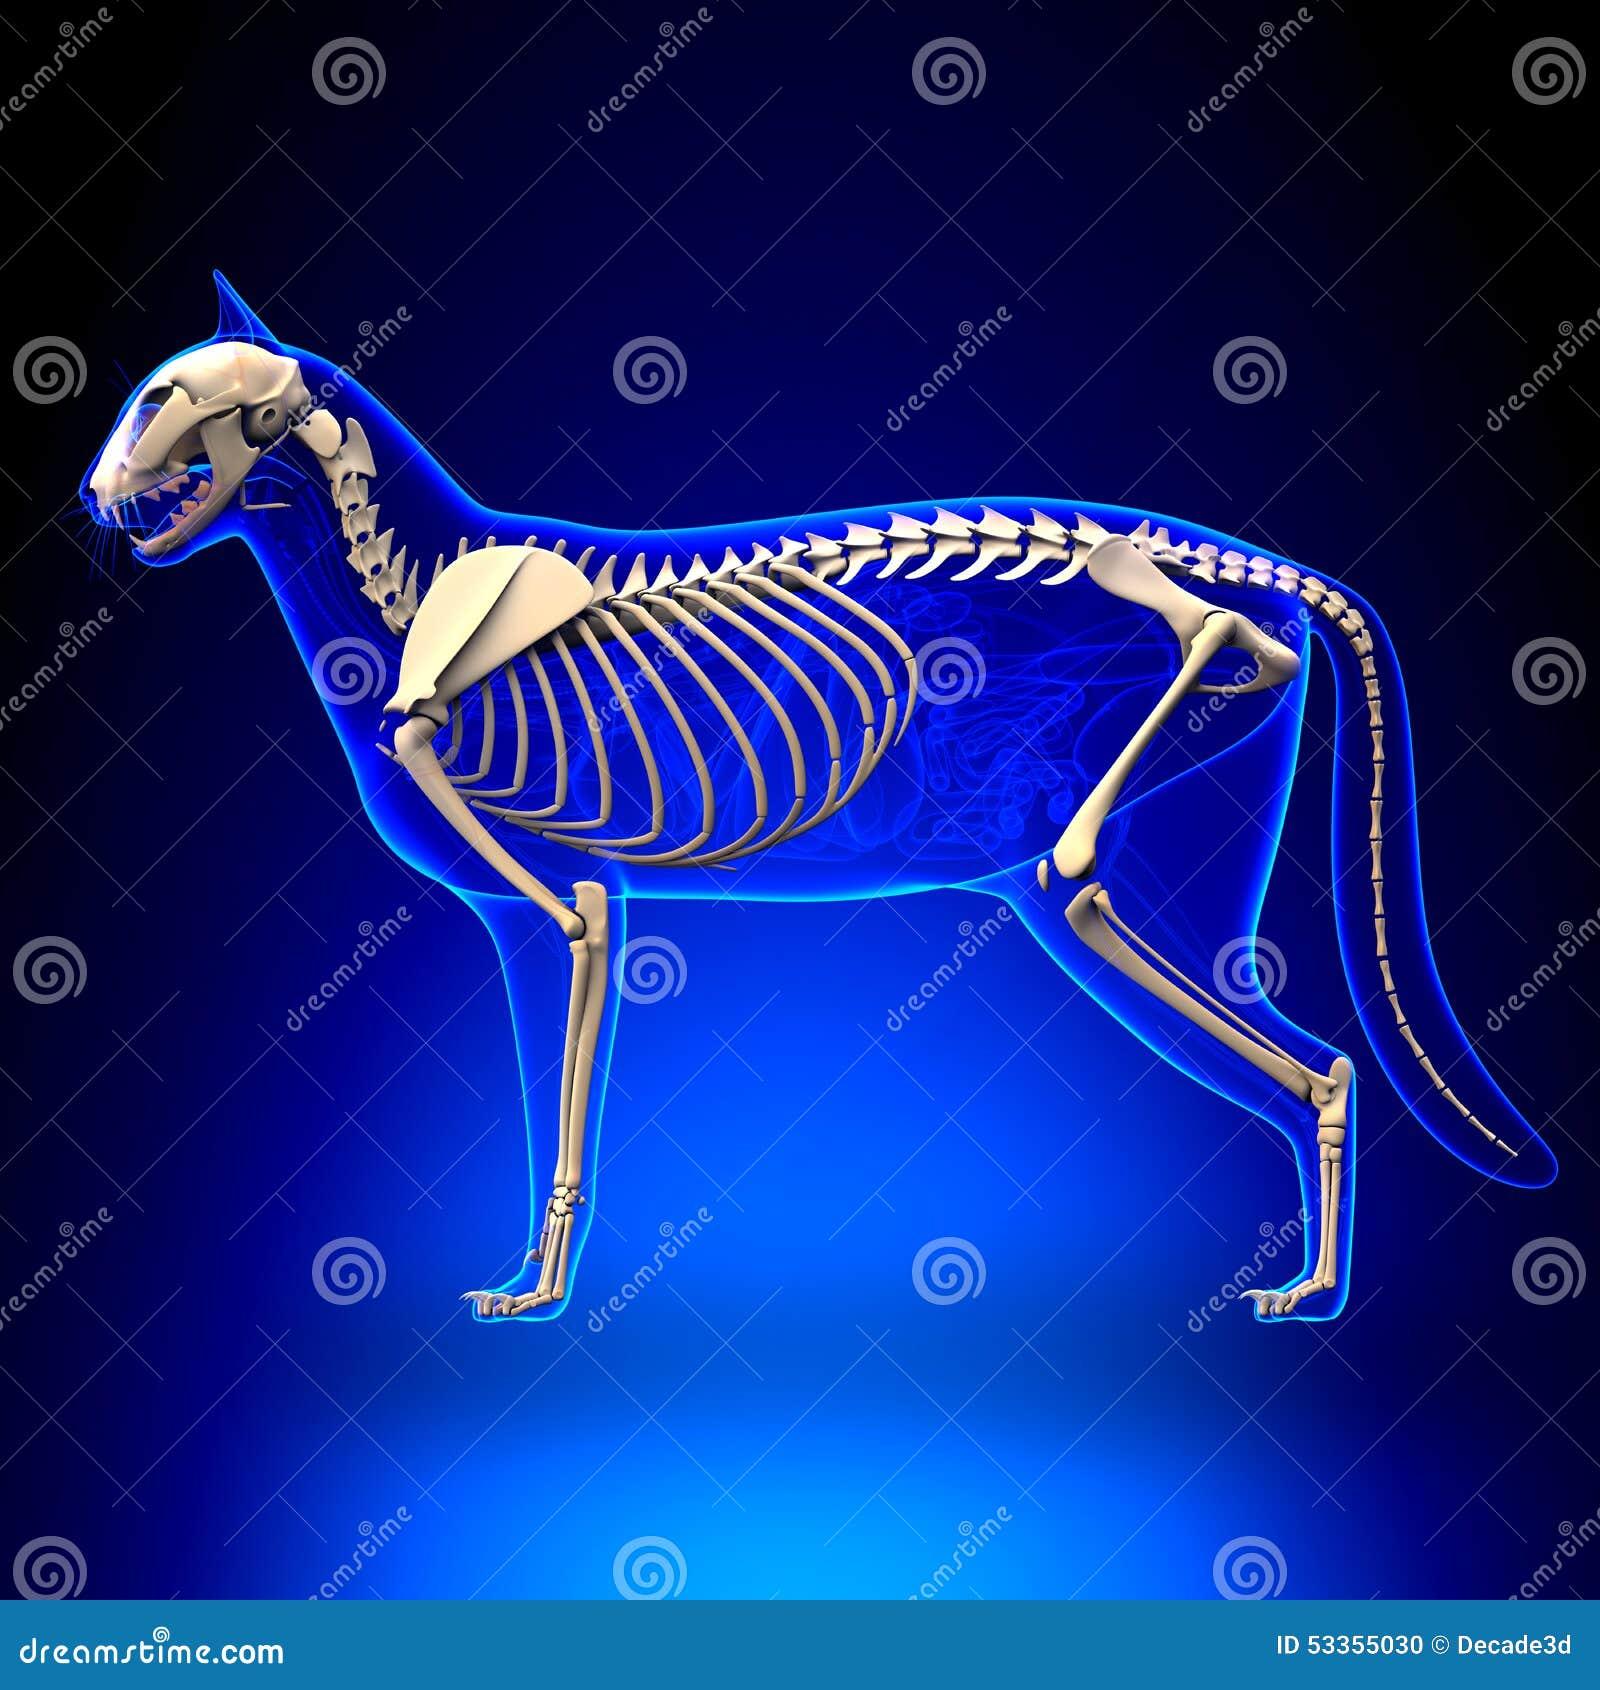 Cat Skeleton Anatomy - Anatomy Of A Cat Skeleton Stock Photo - Image ...